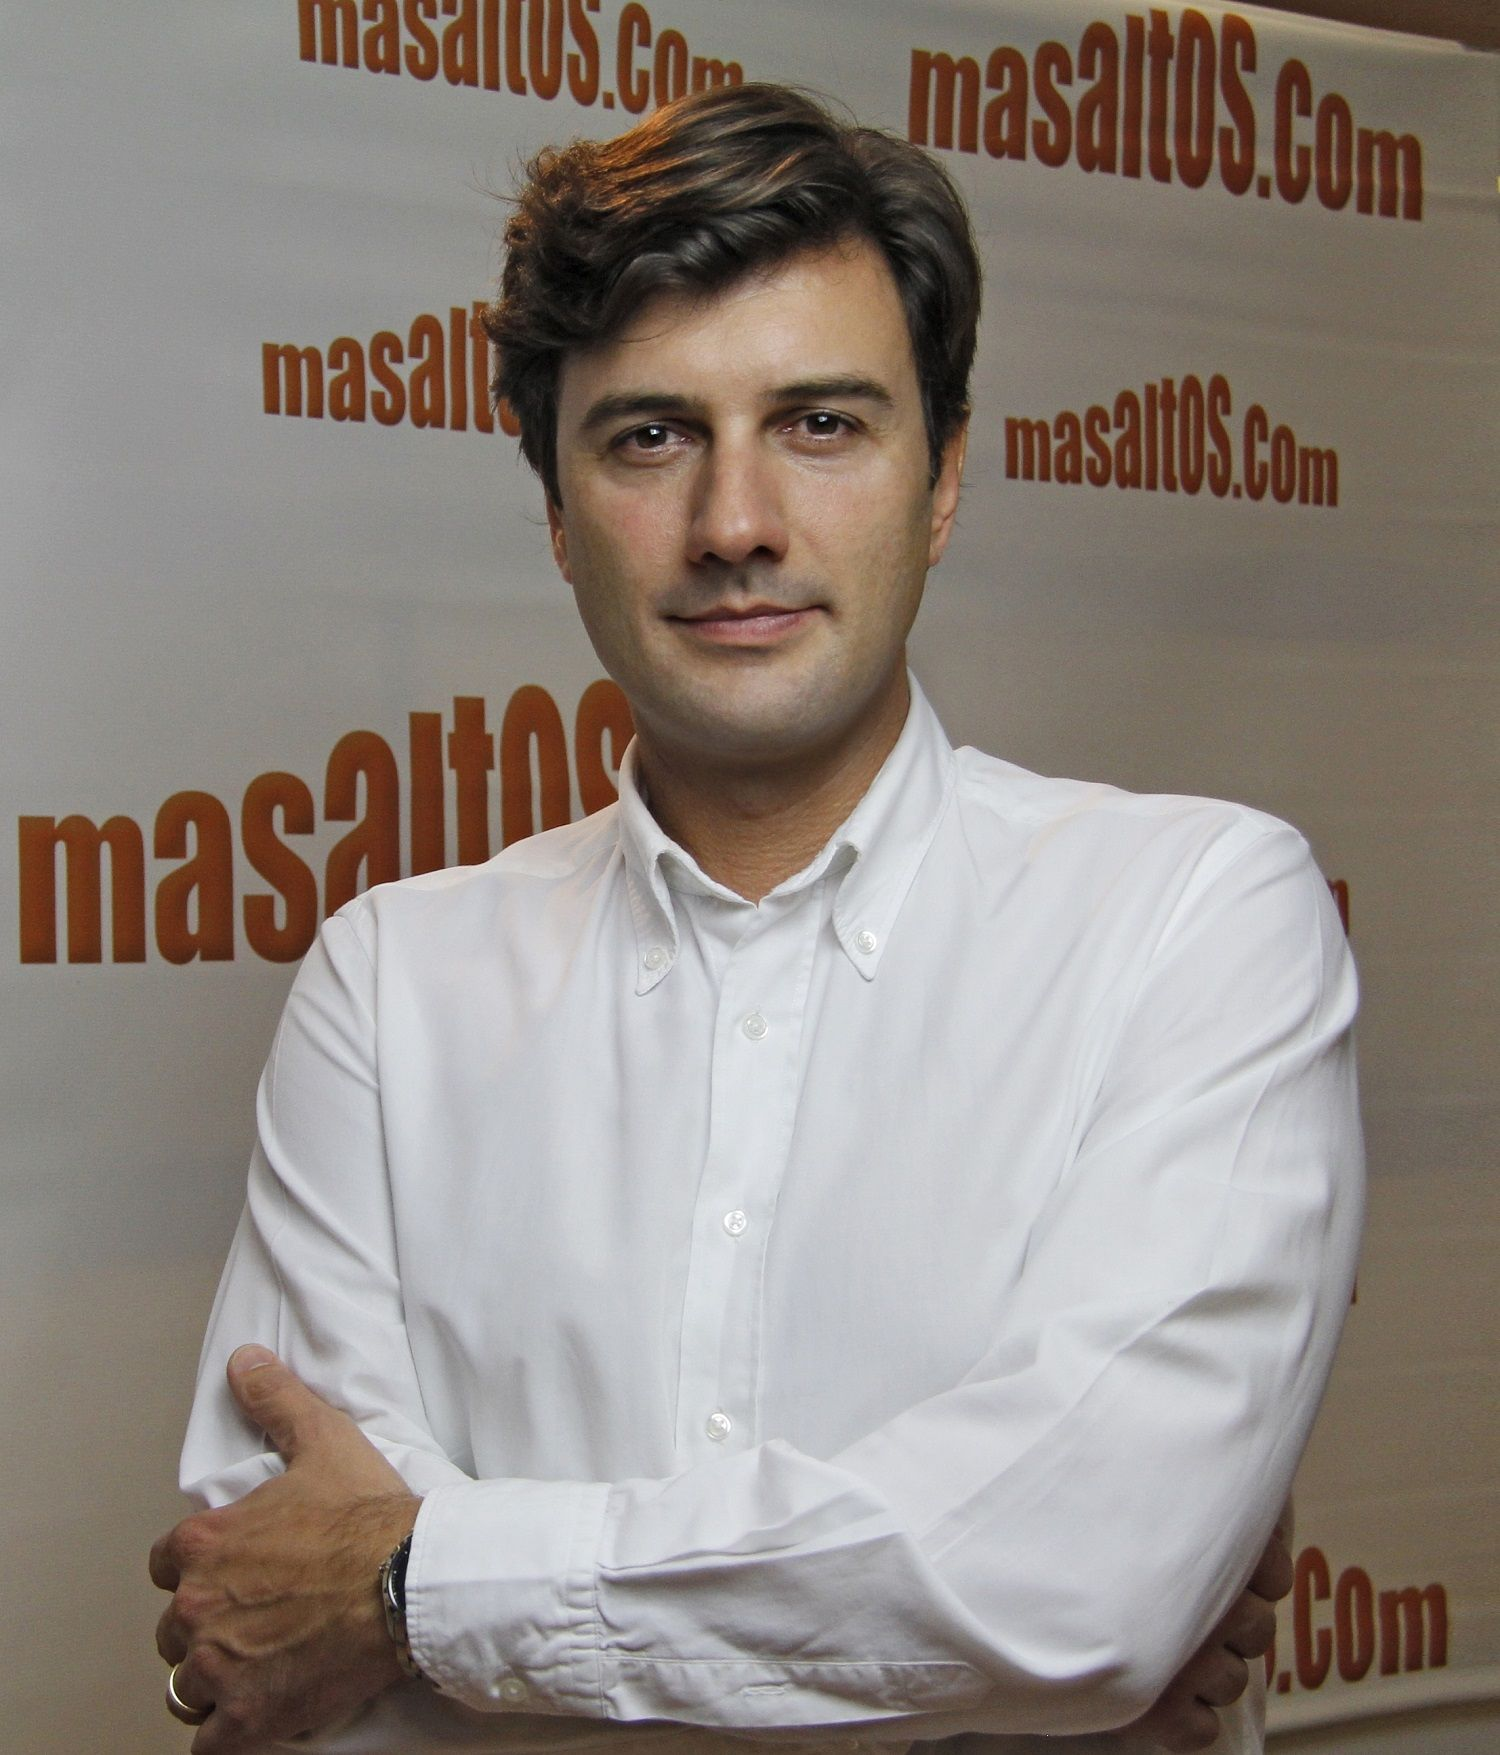 Foto de Antonio Fagundo Masaltos